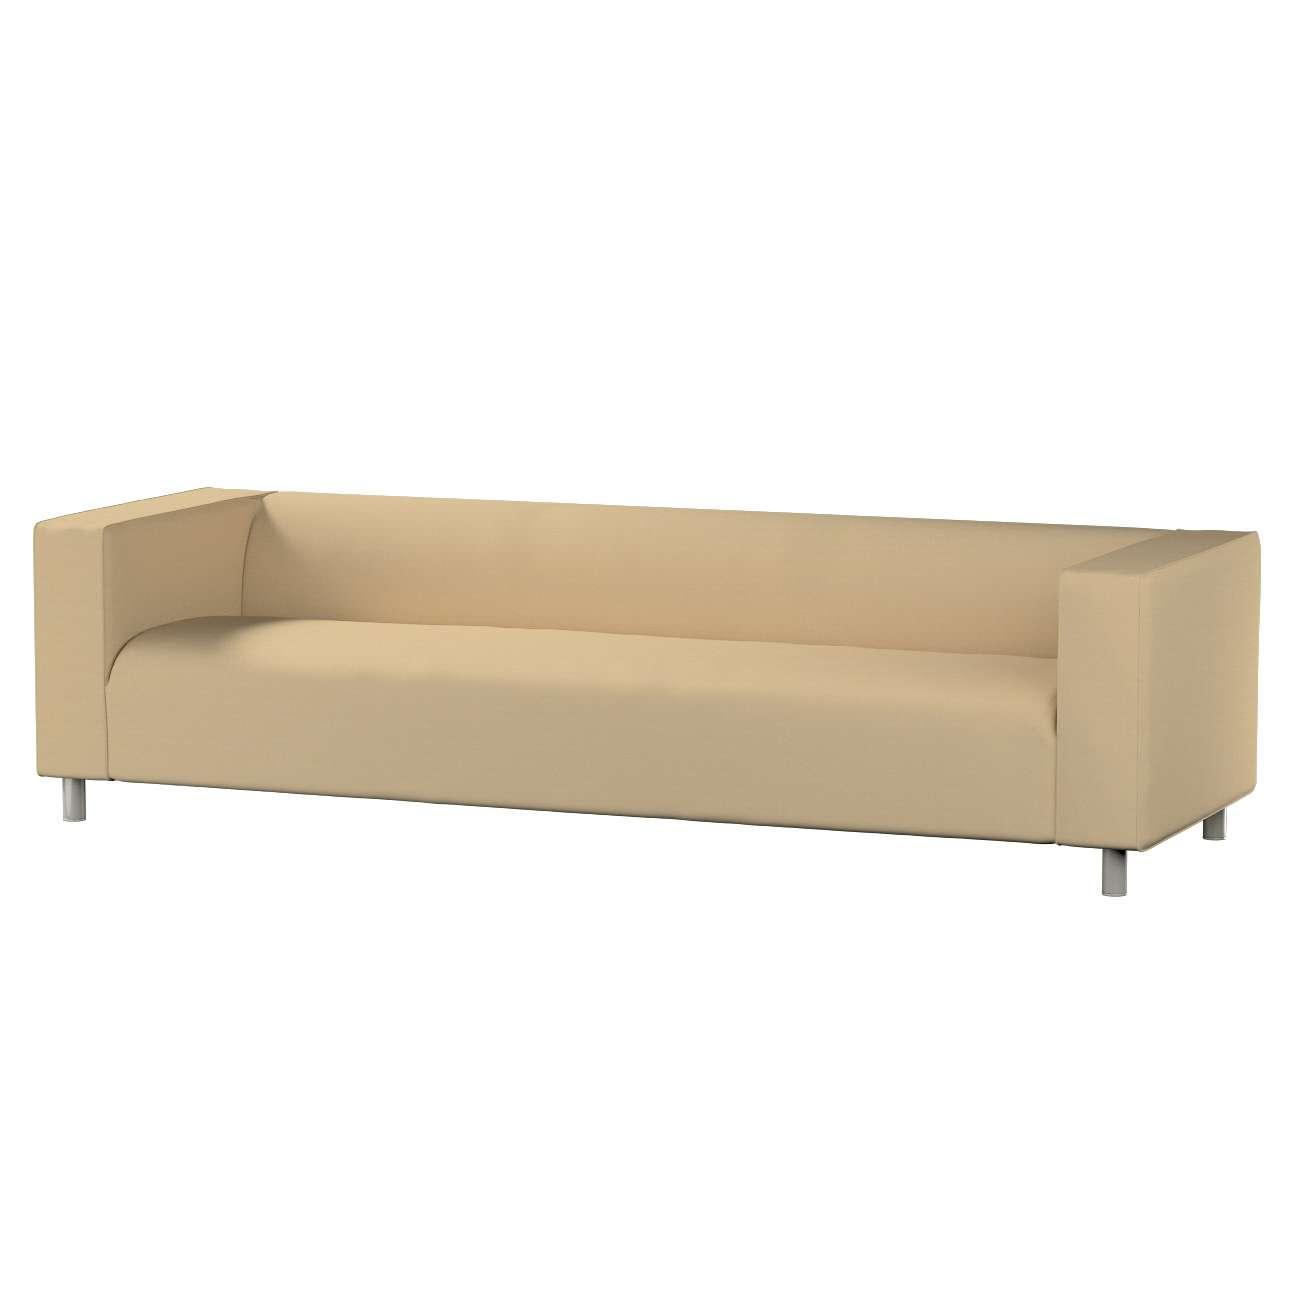 Klippan 4-Sitzer Sofabezug, caffe latte, Klippan 4-Sitzer, Cotton Panama